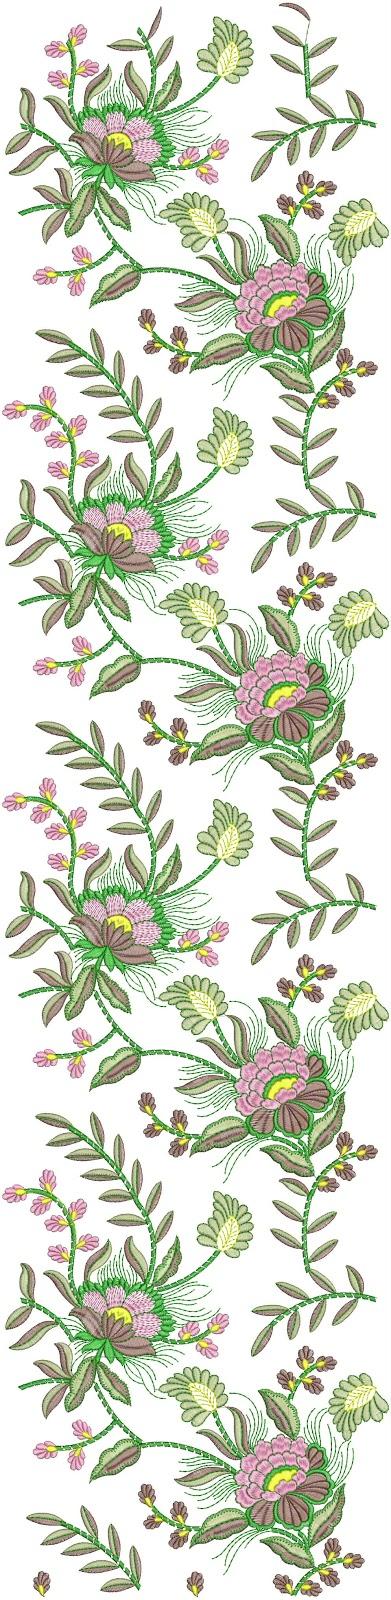 Embdesigntube Fresh Garment Embroidery Design Download